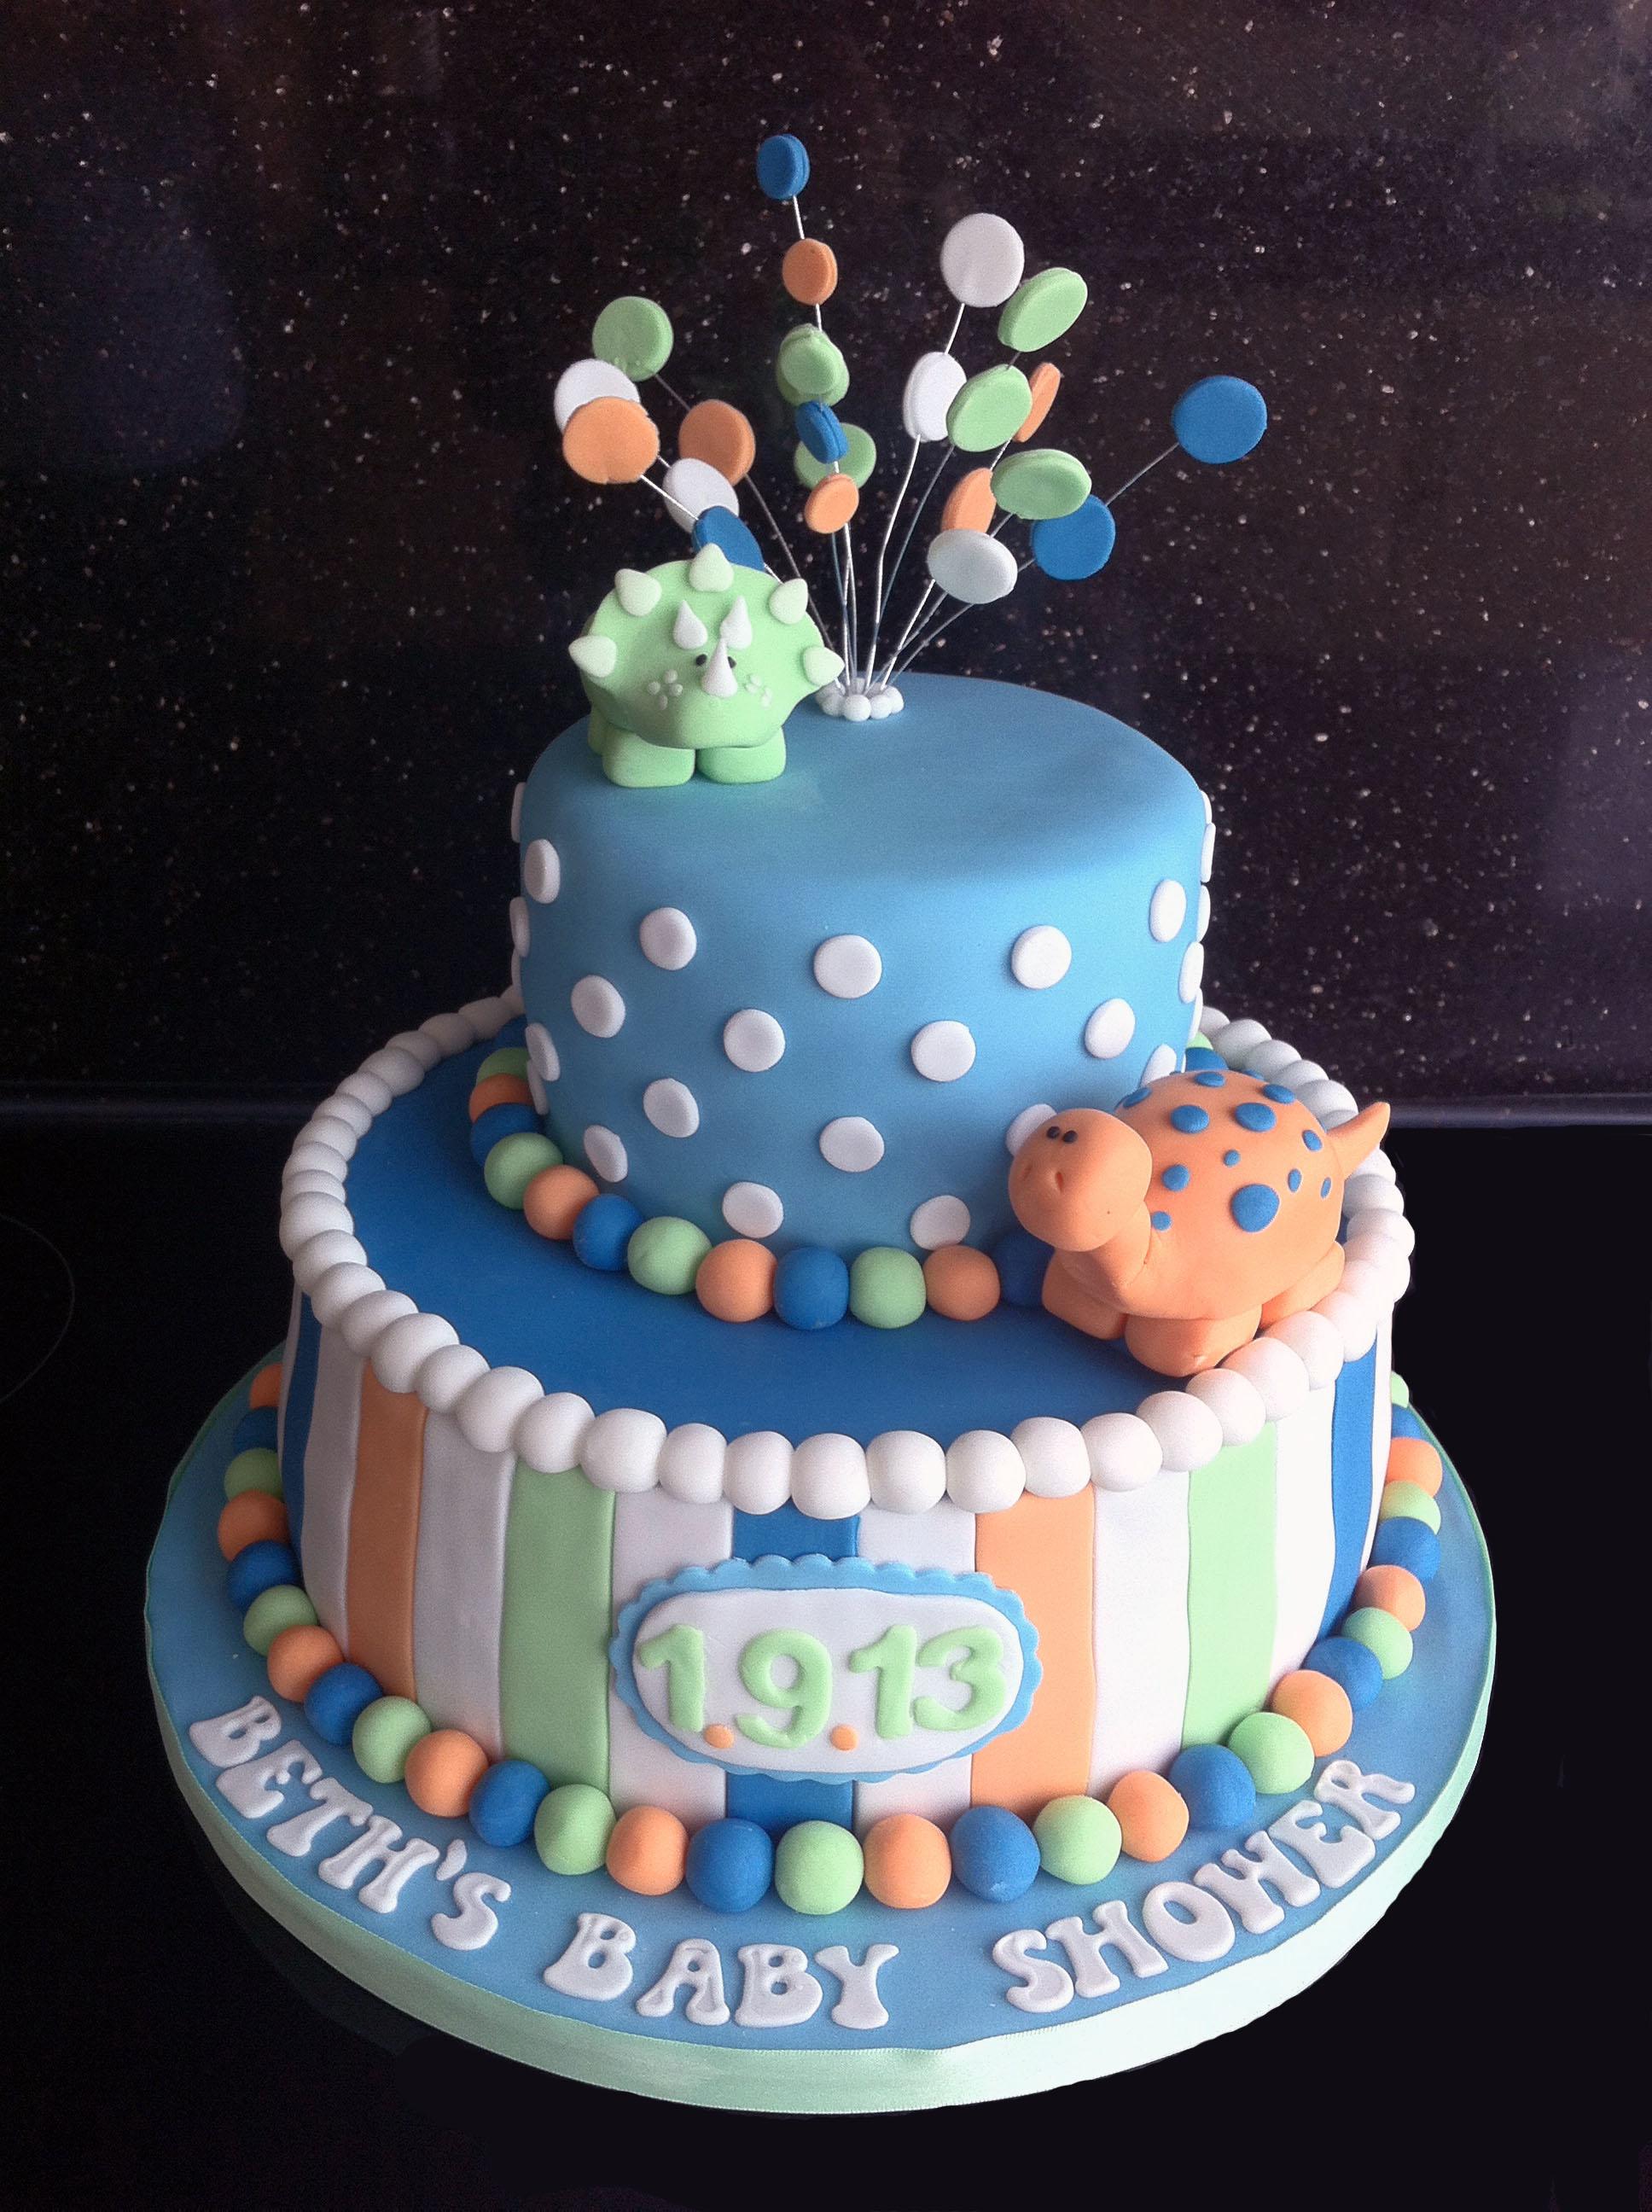 Baby Shower Cakes Cardiff ~ Dinosaur baby shower the great british bake off